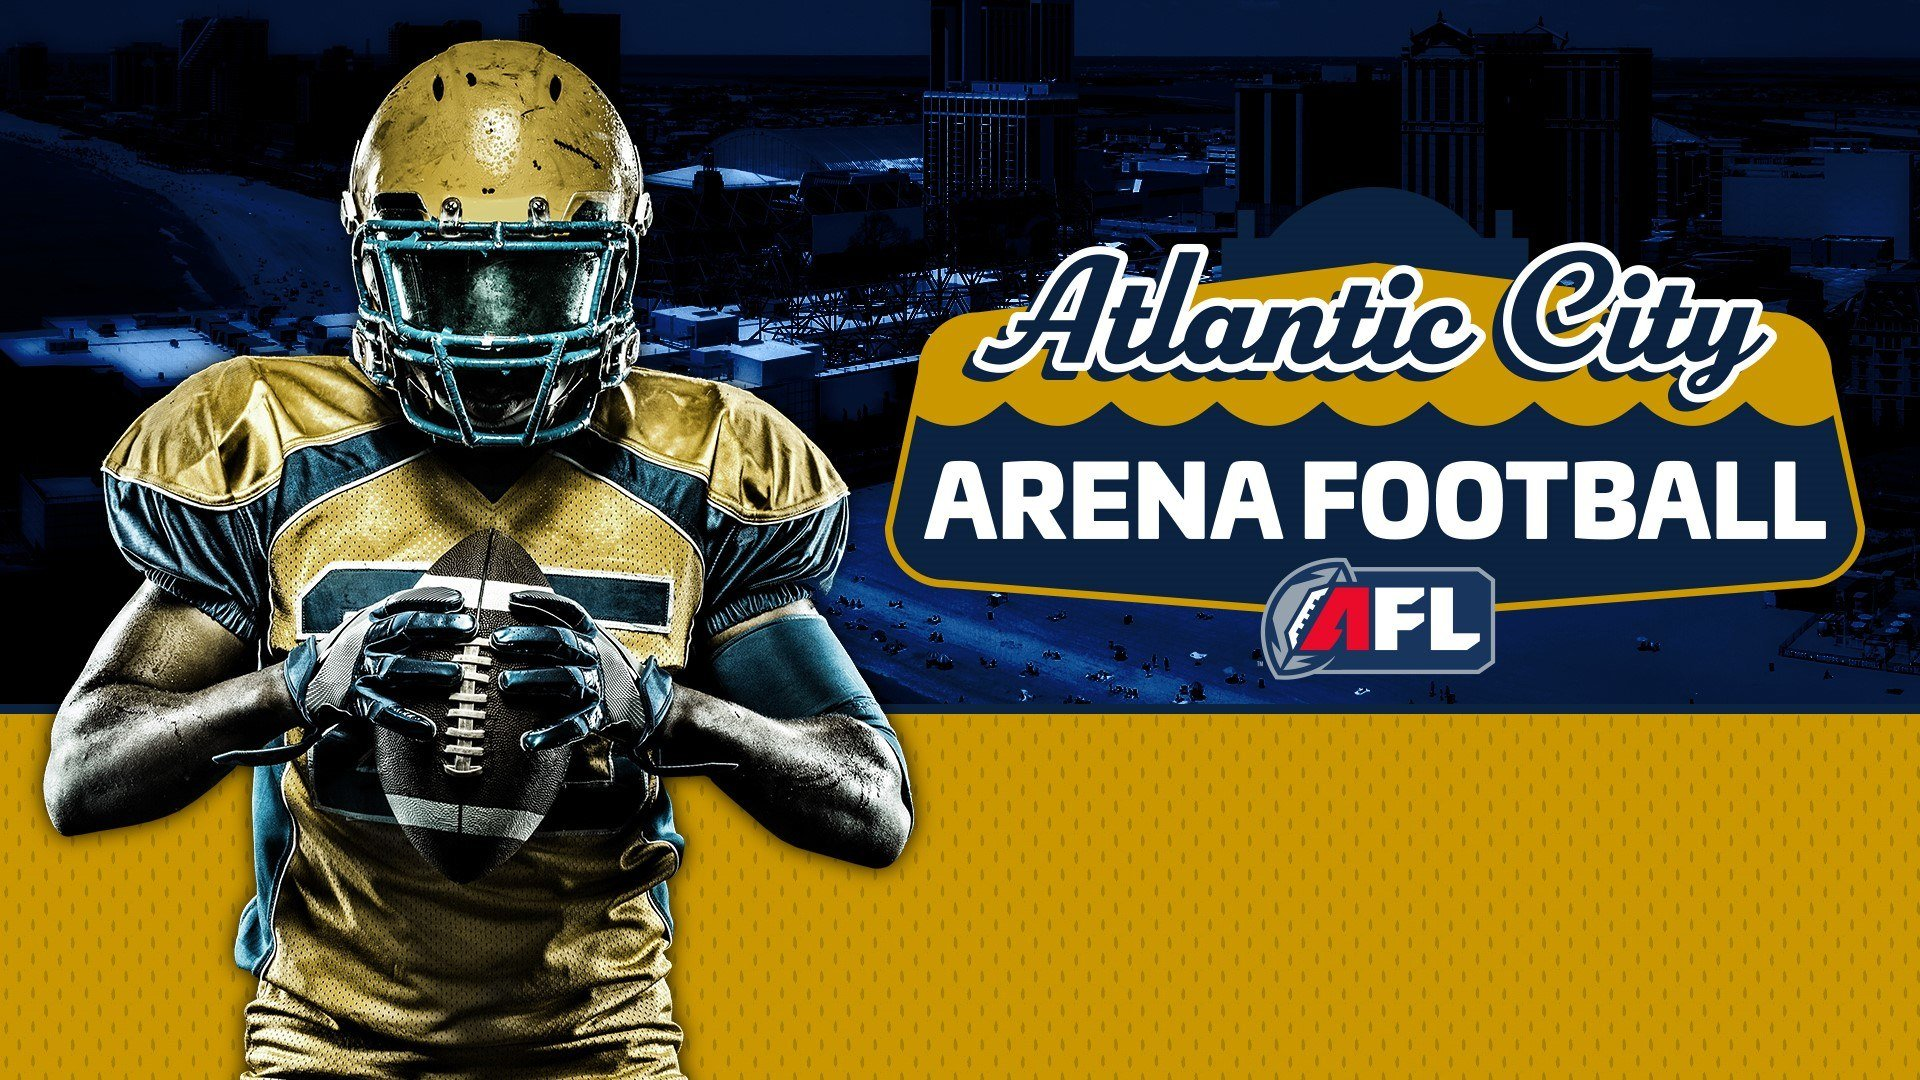 Arena Football League Atlantic City